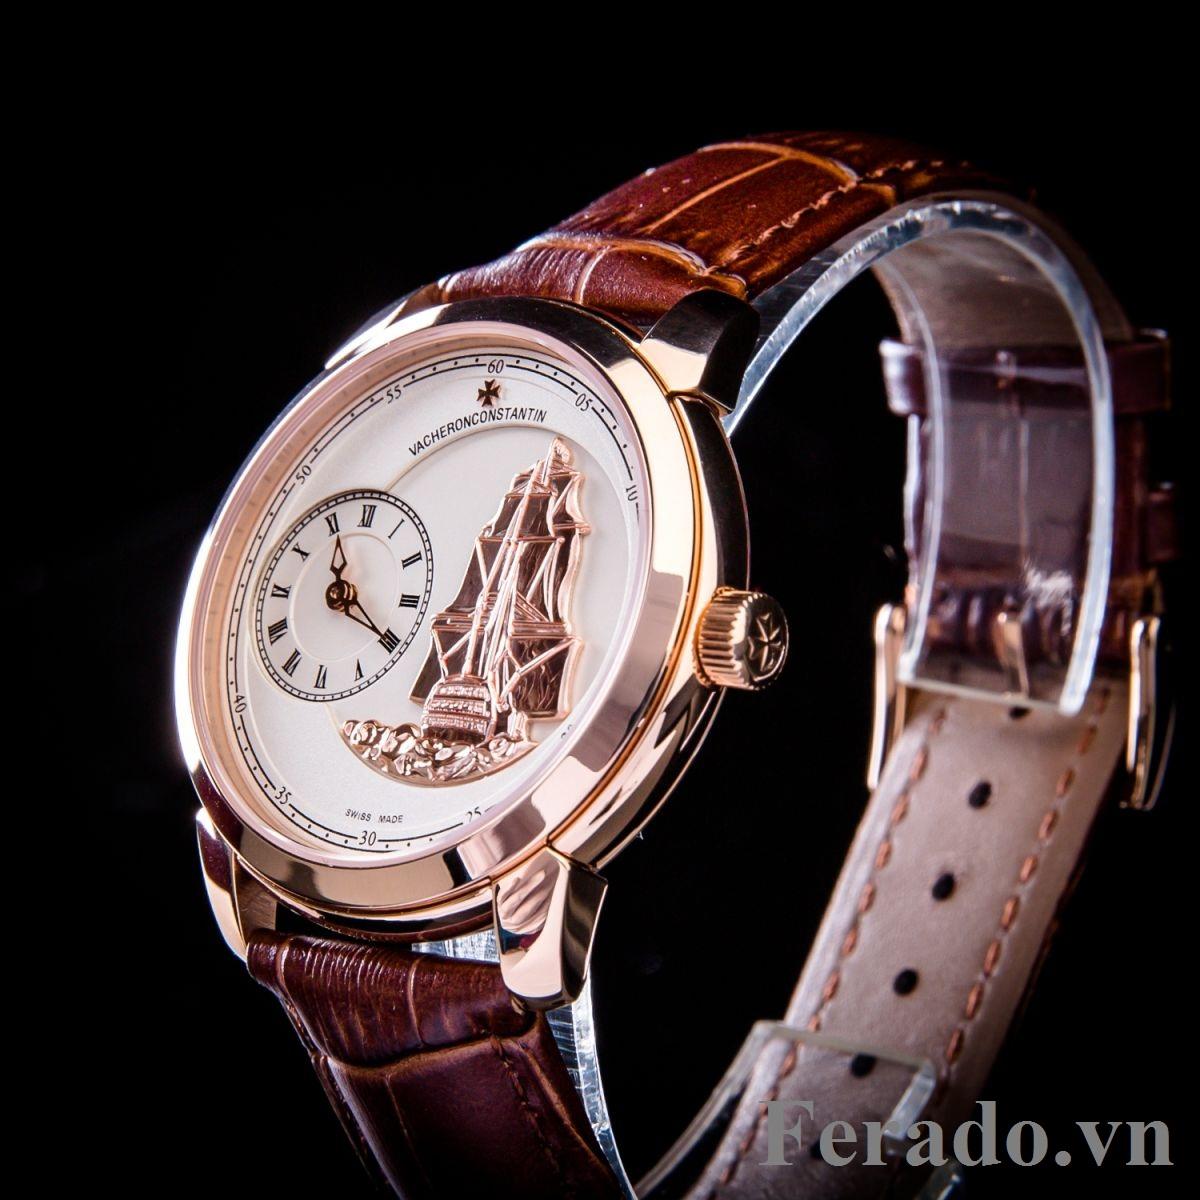 Đồng hồ Vacheron Constantin VC002.